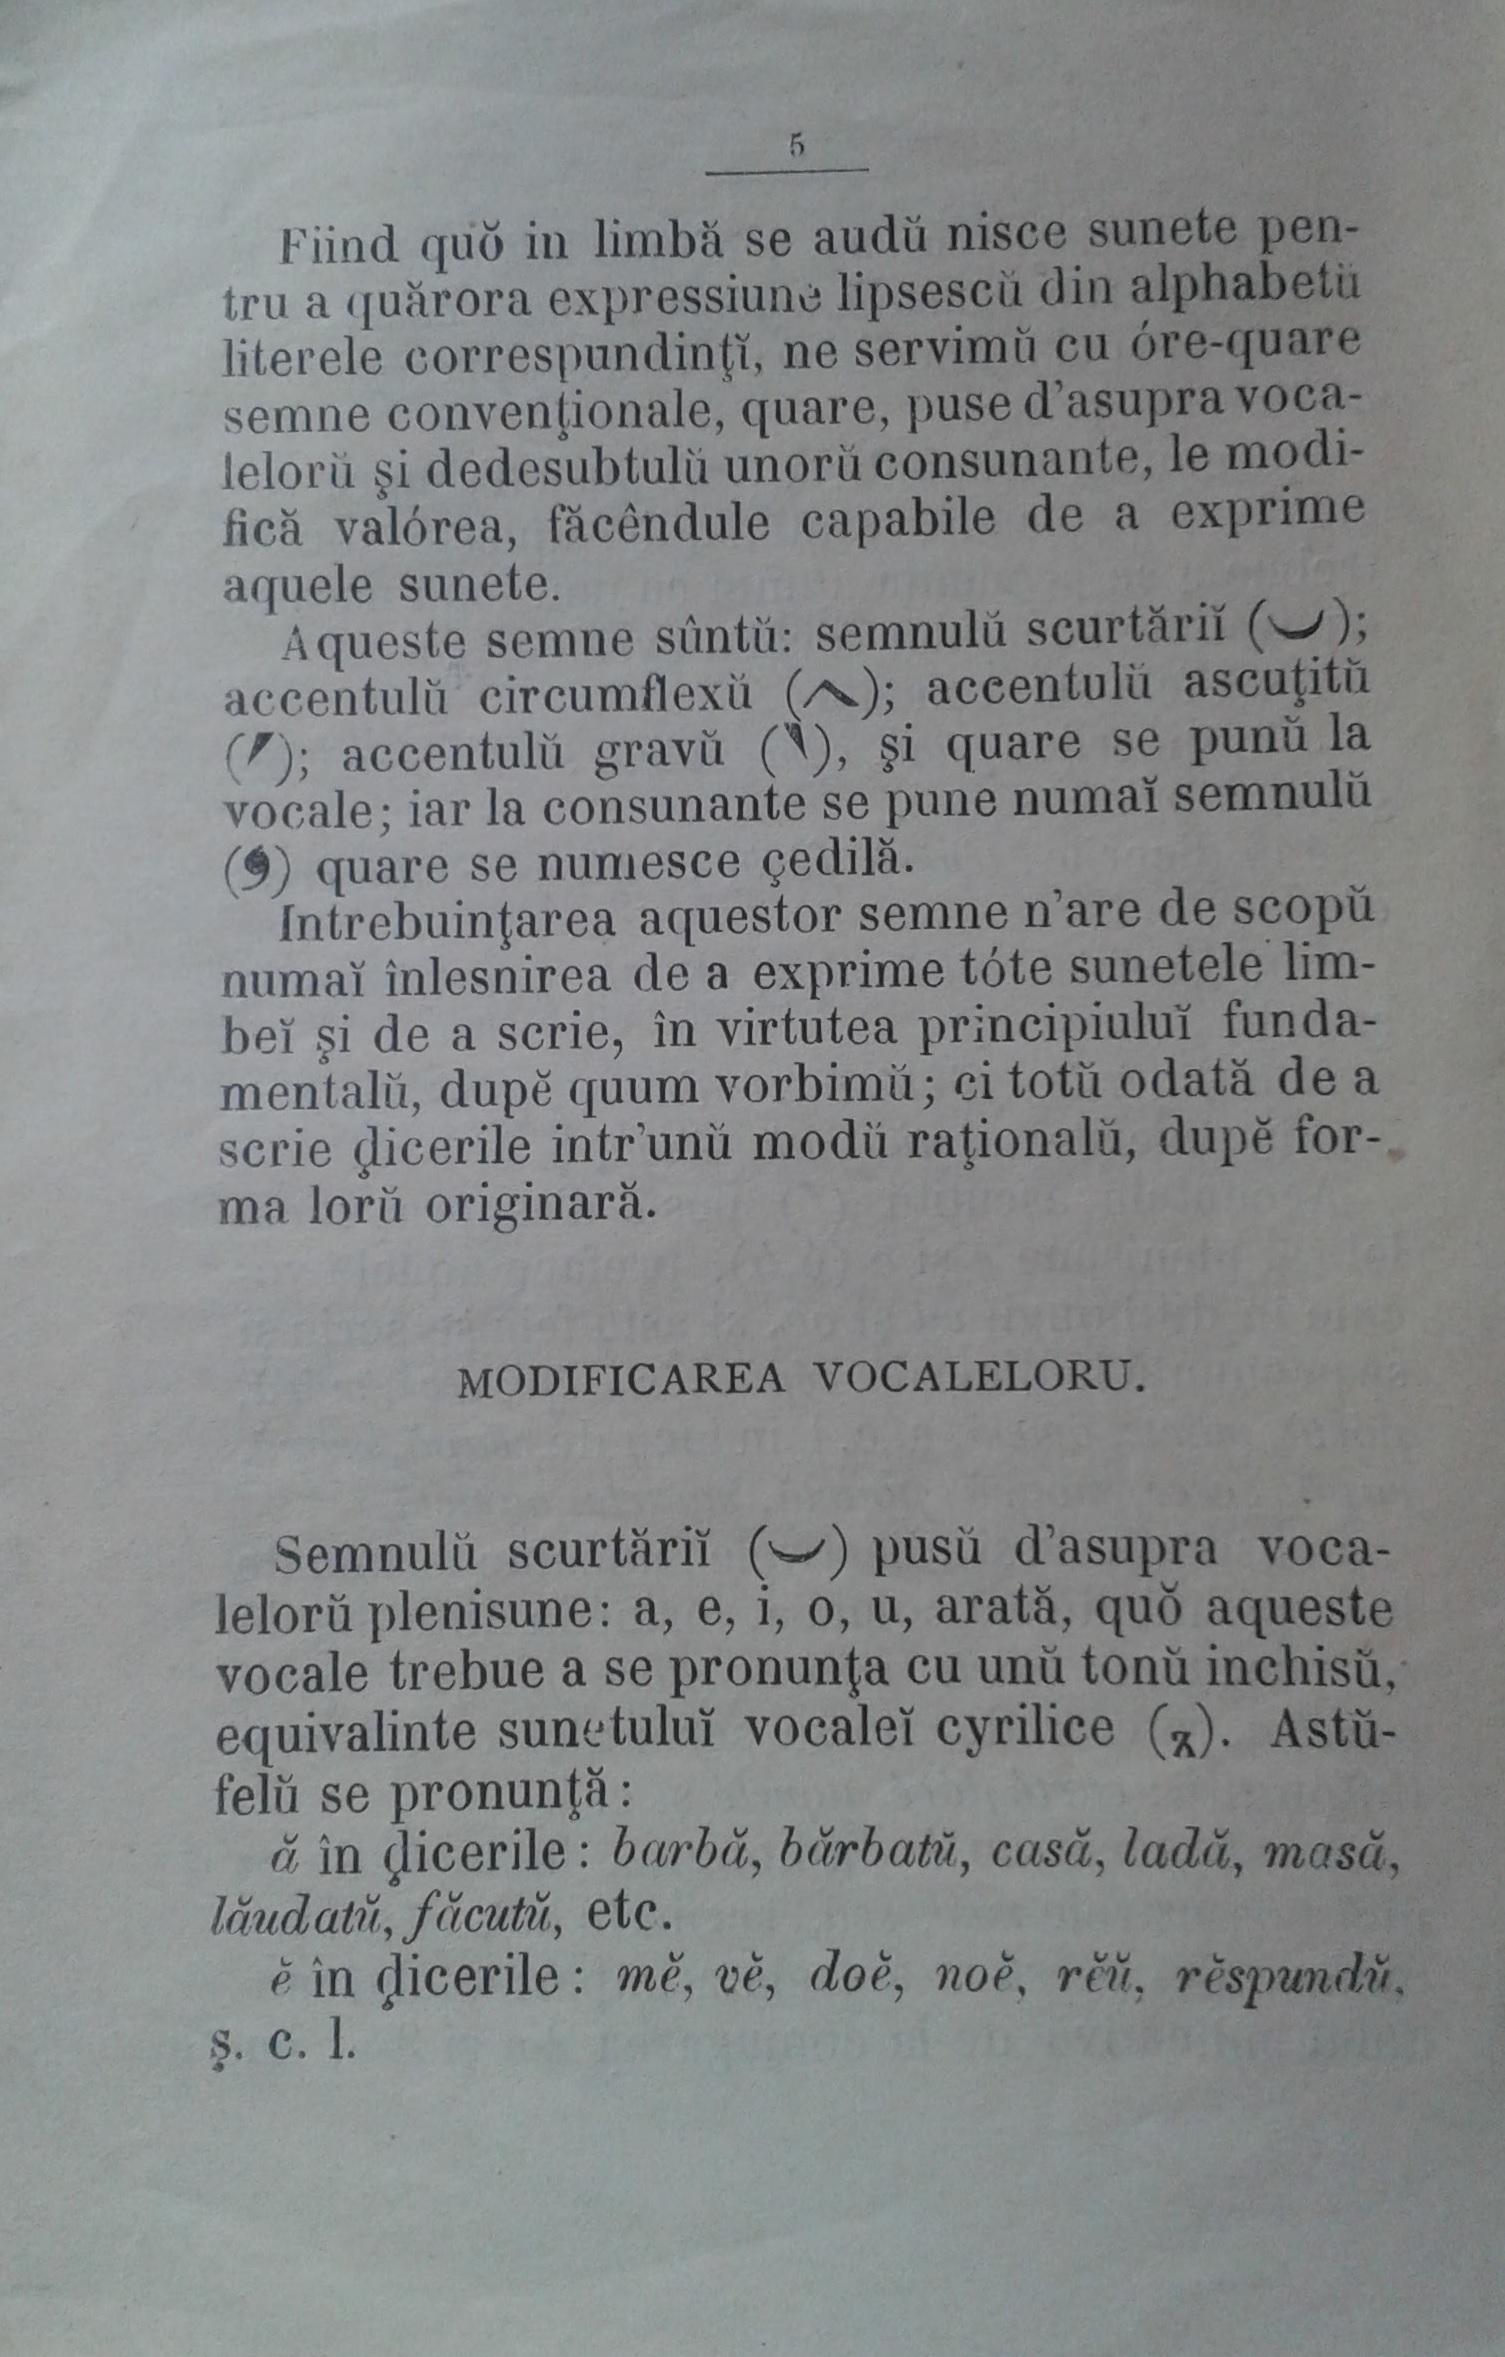 Regule ortografice 1871 (4).jpg